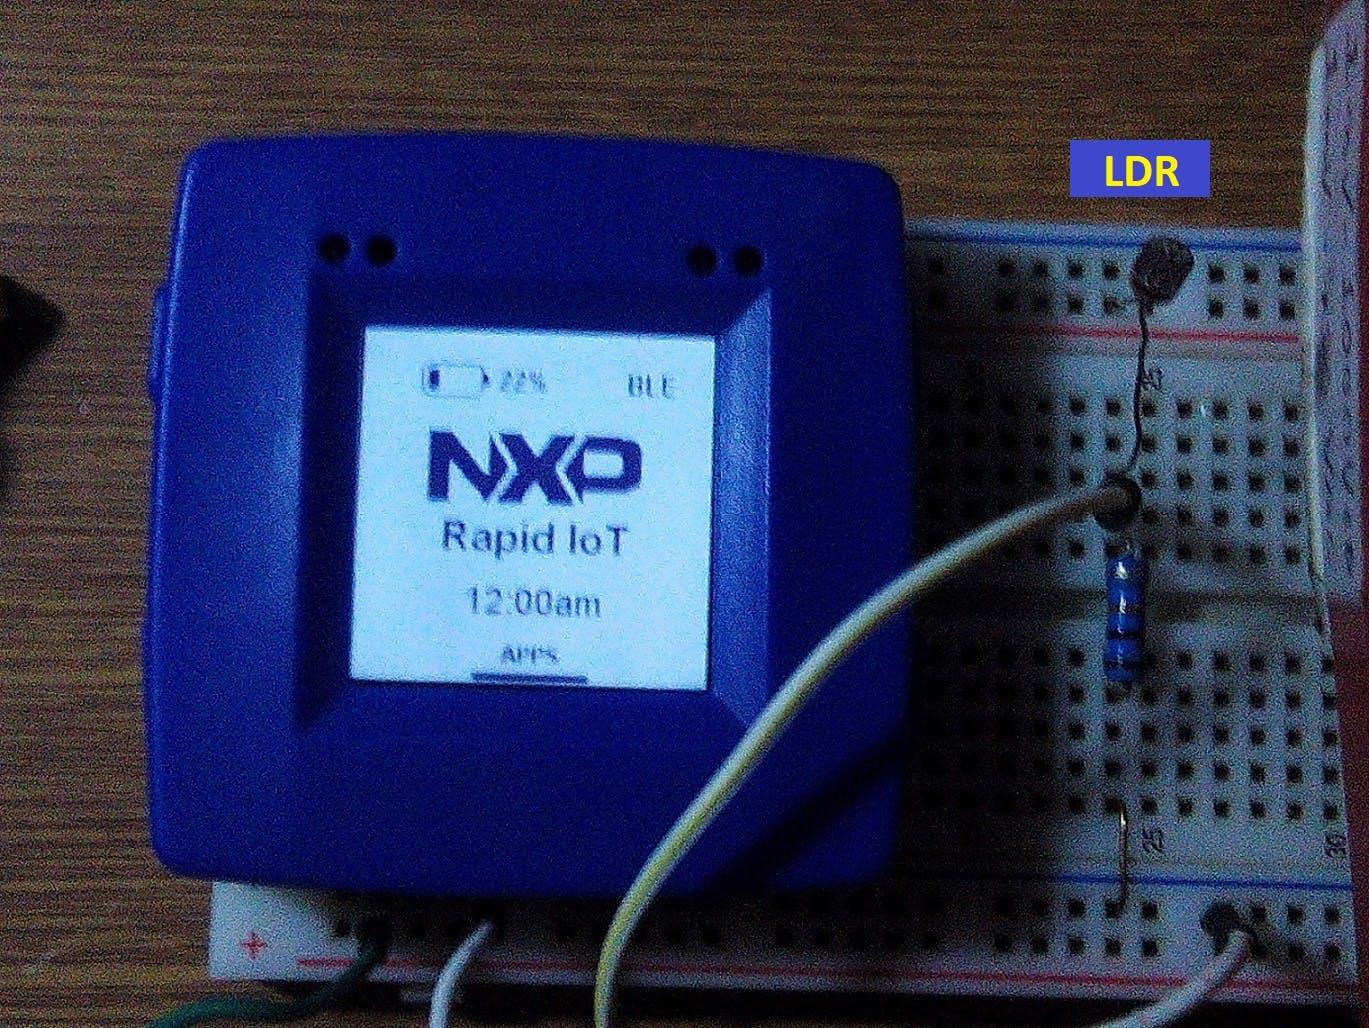 Using a NXP Rapid IoT as lighting calibrator